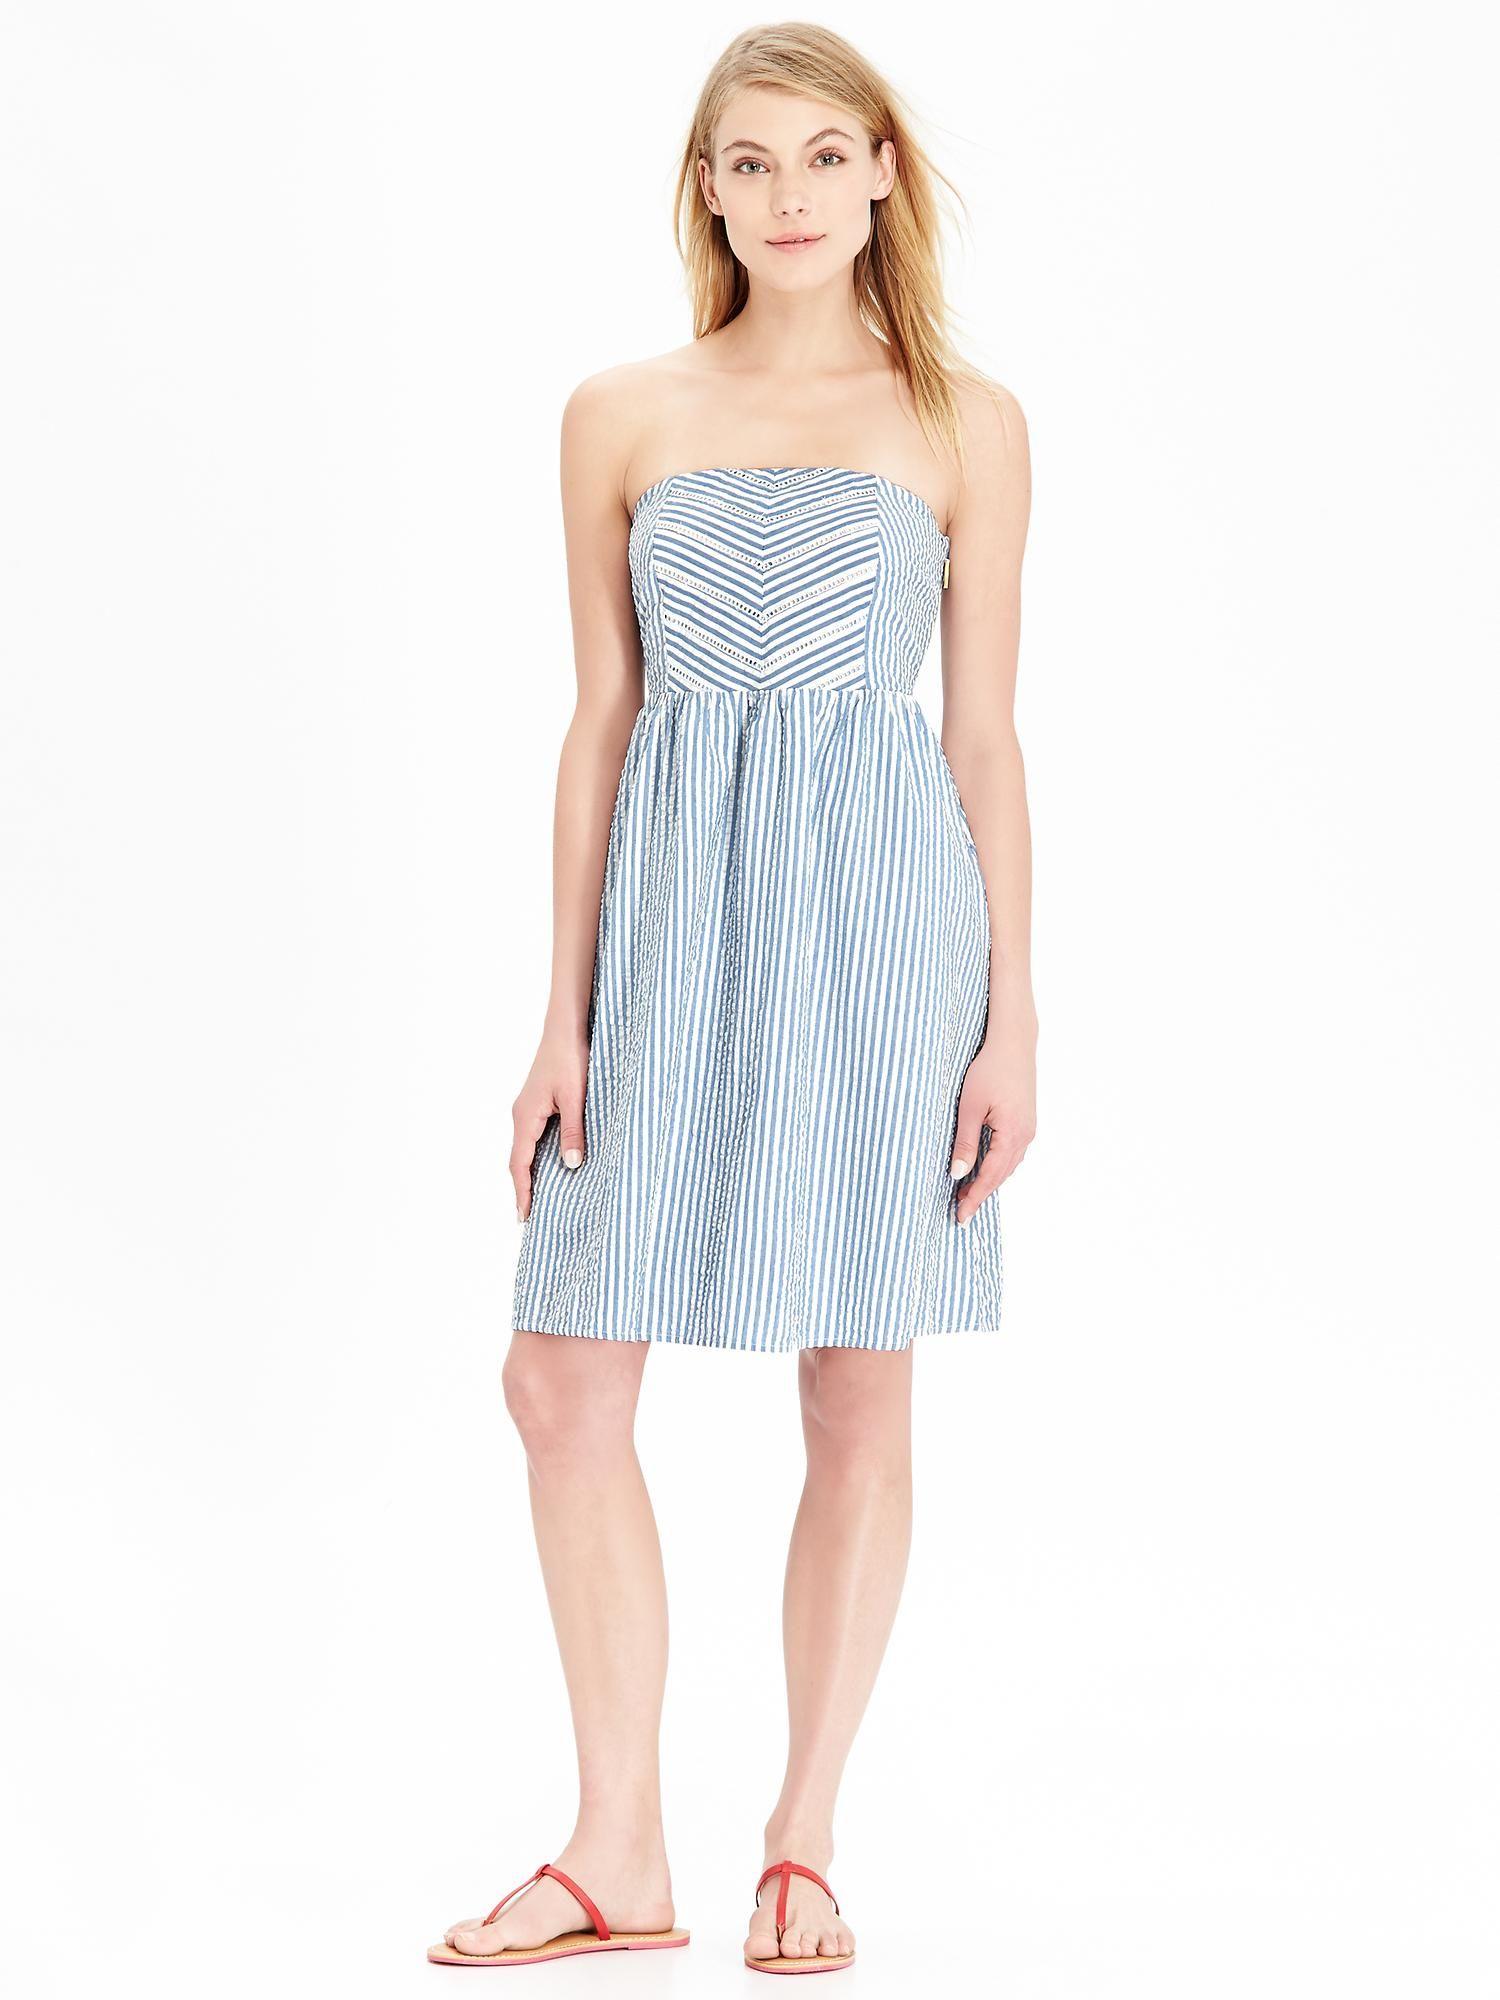 Old Navy Women S Striped Strapless Seersucker Dresses My Dream